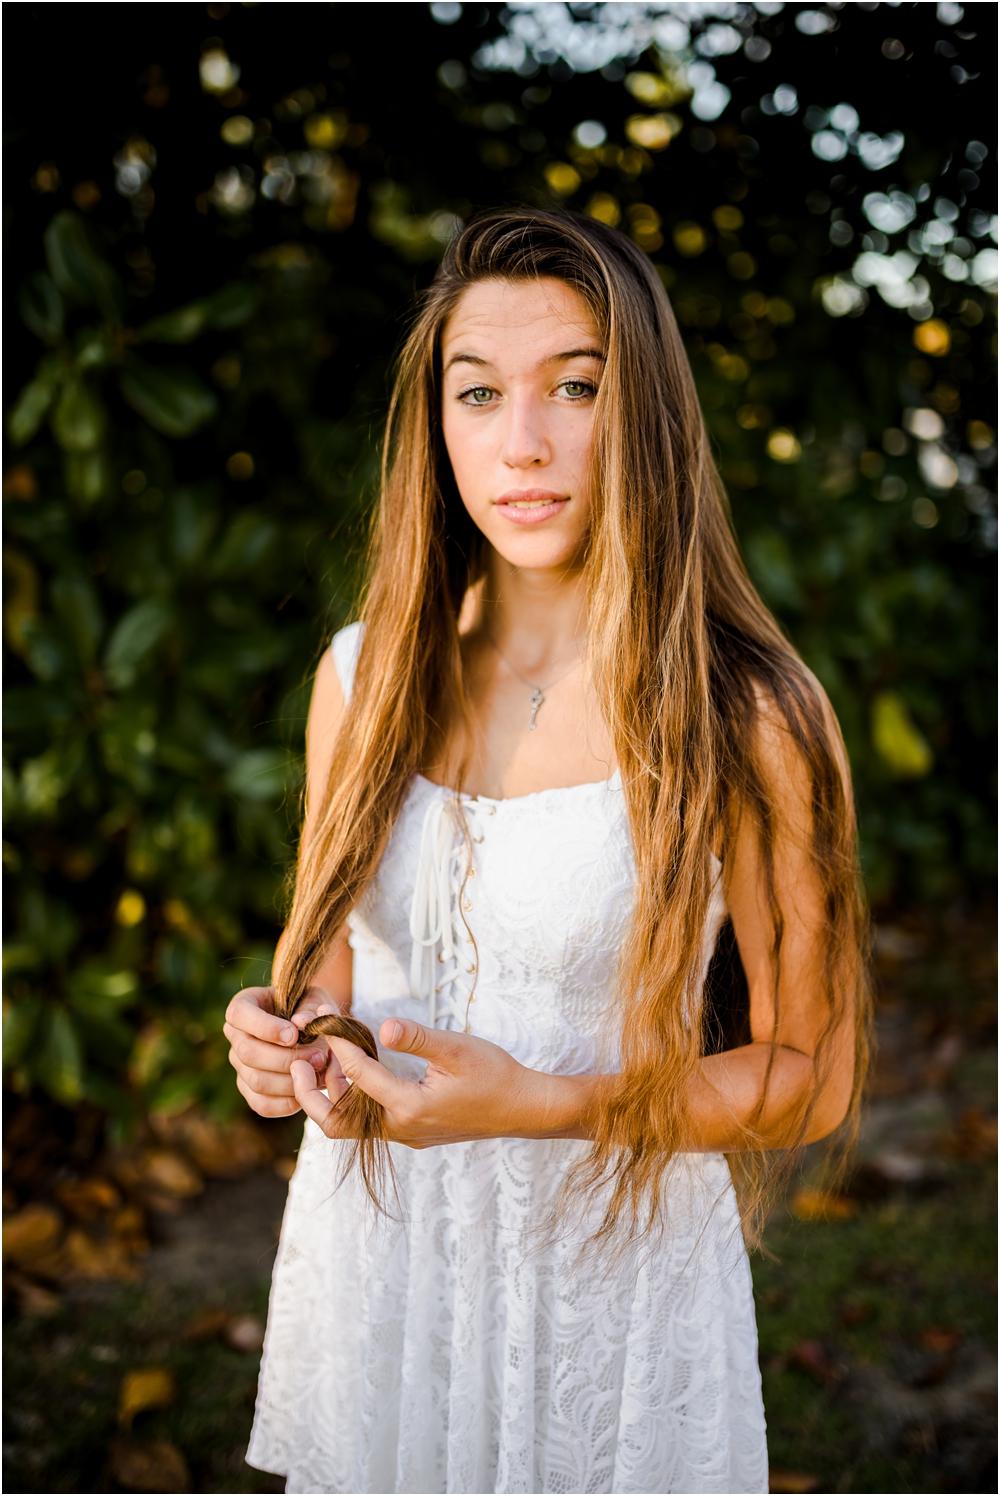 florida-senior-photographer-kiersten-grant-24.jpg